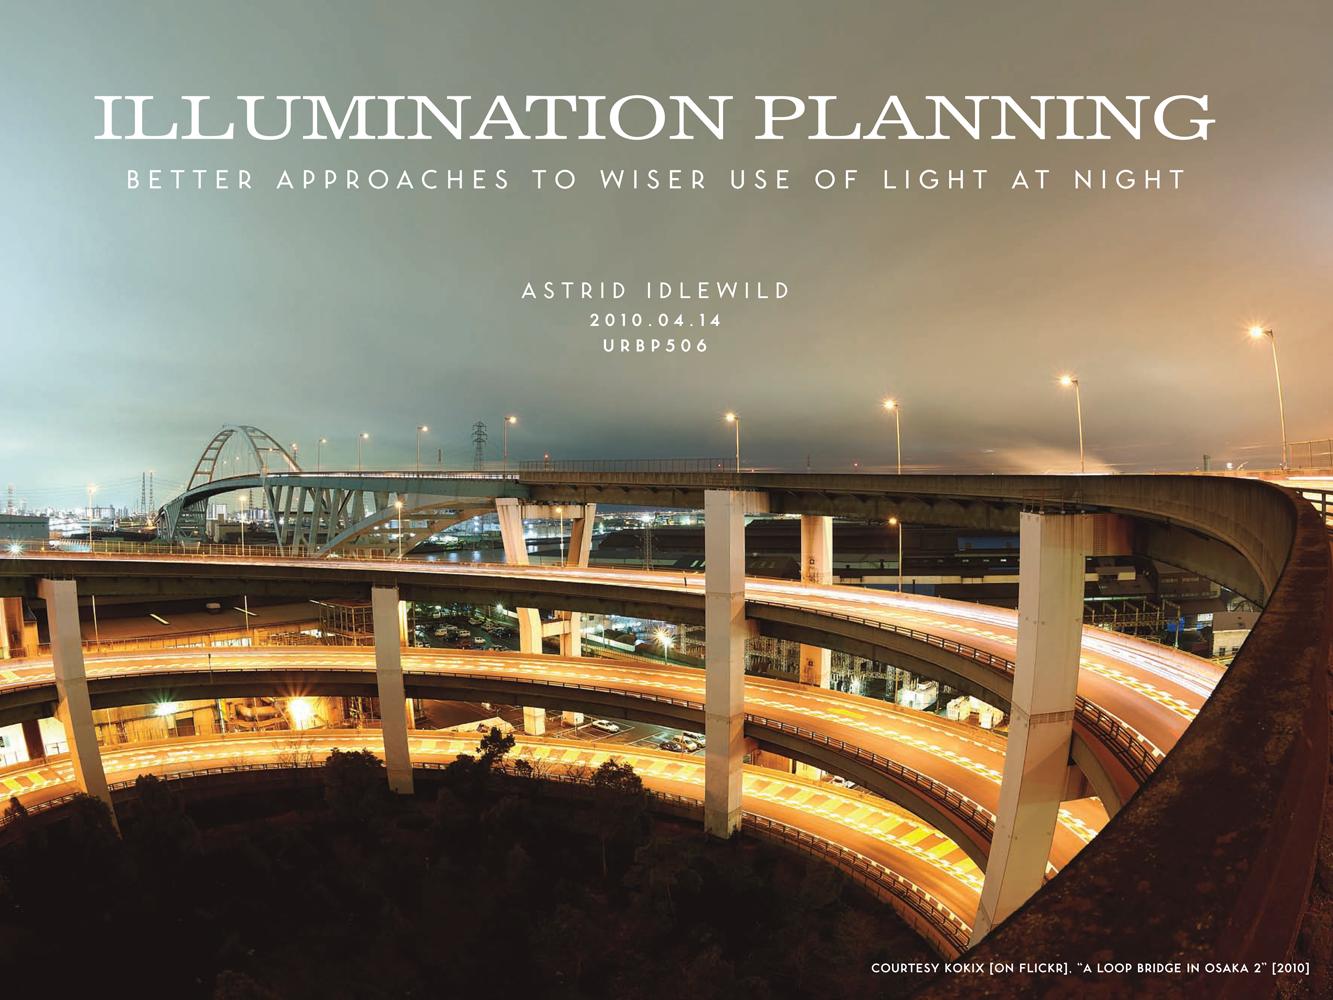 2010.04.14 506H102 Illumination Planning cover